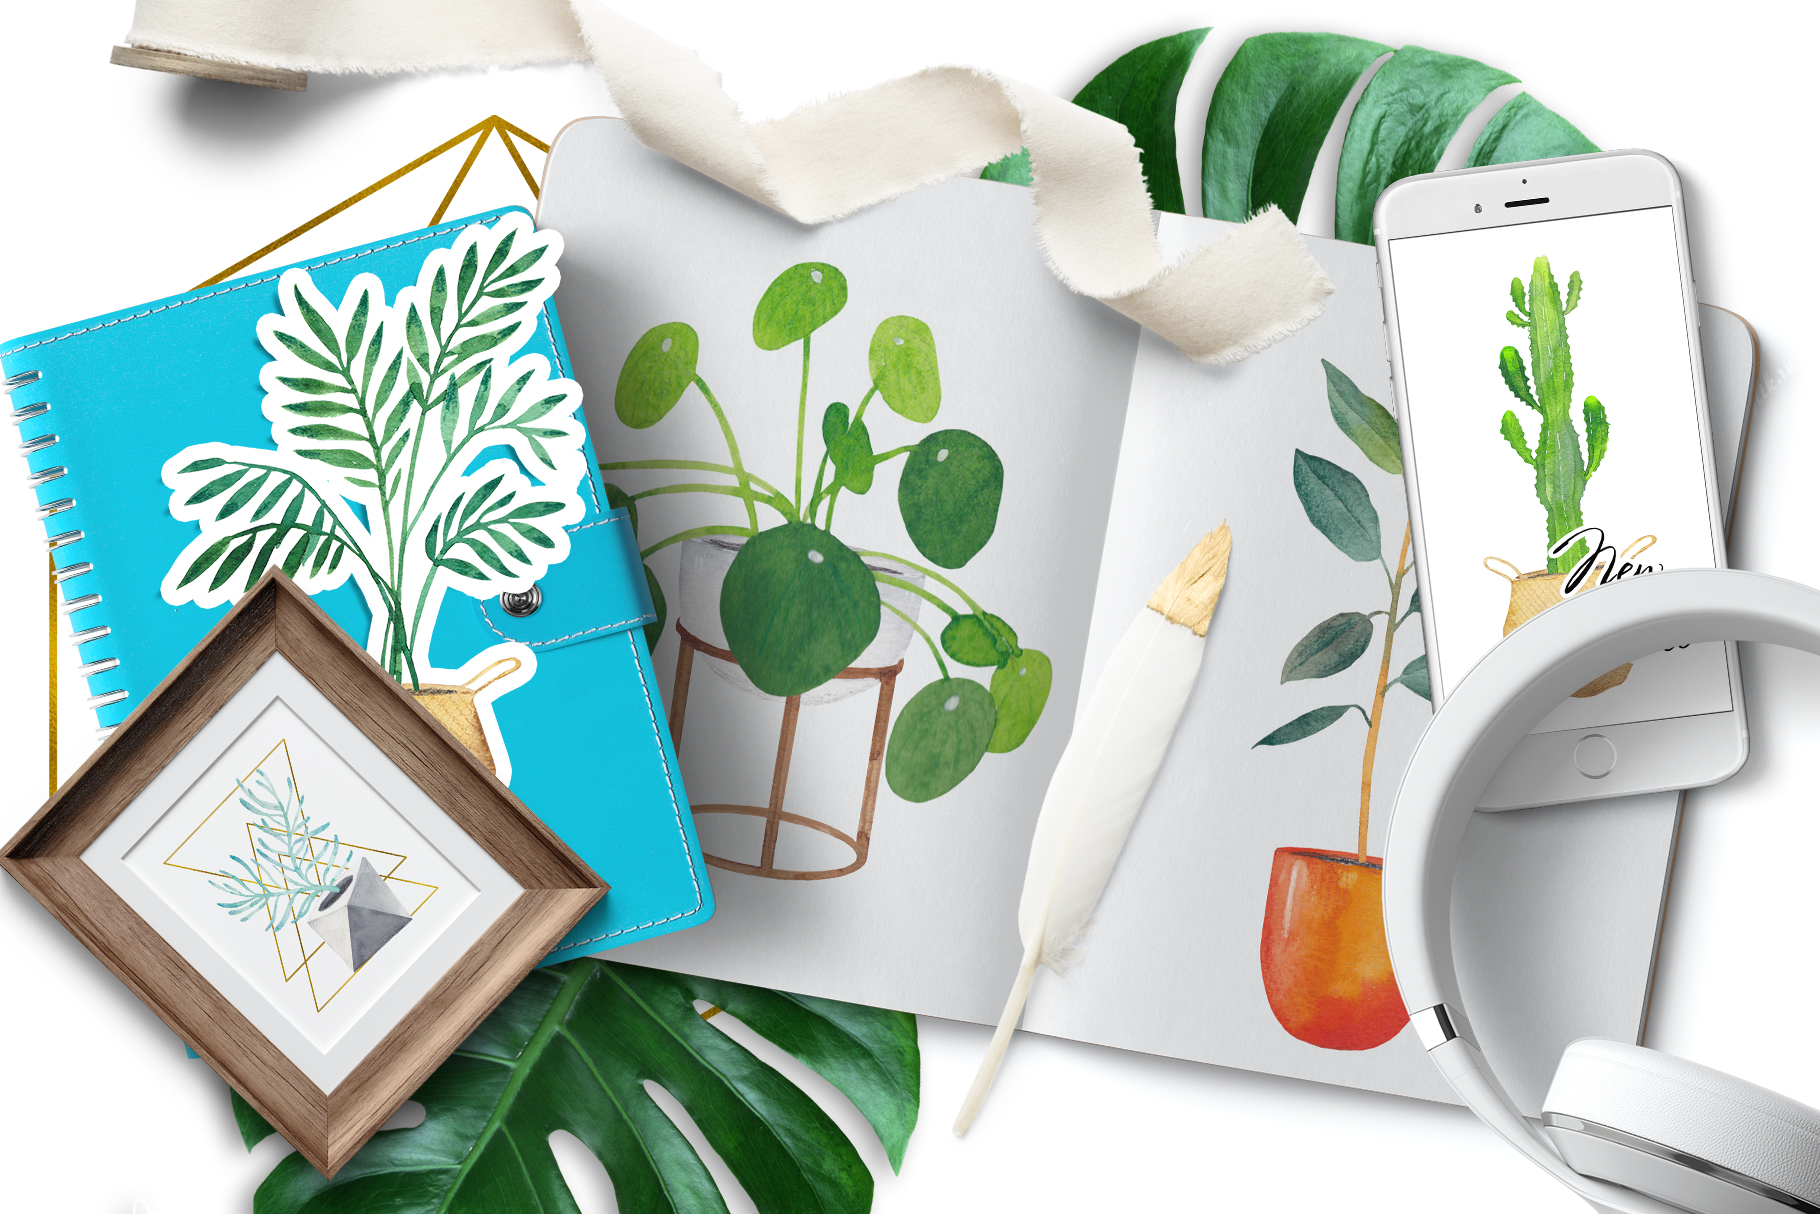 Scandi house plants interior creator example image 2